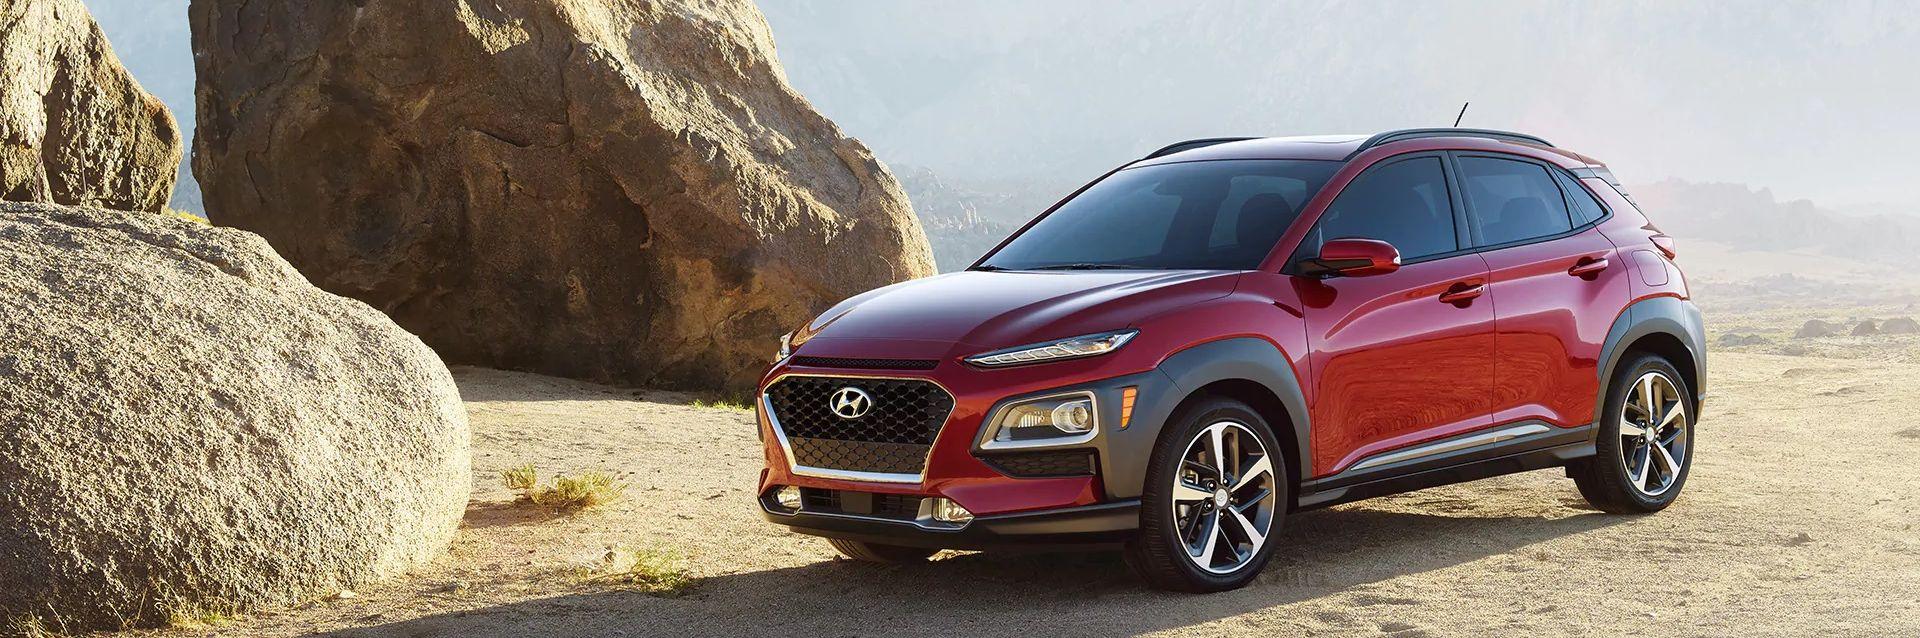 2019 Hyundai Kona Leasing near Washington, DC